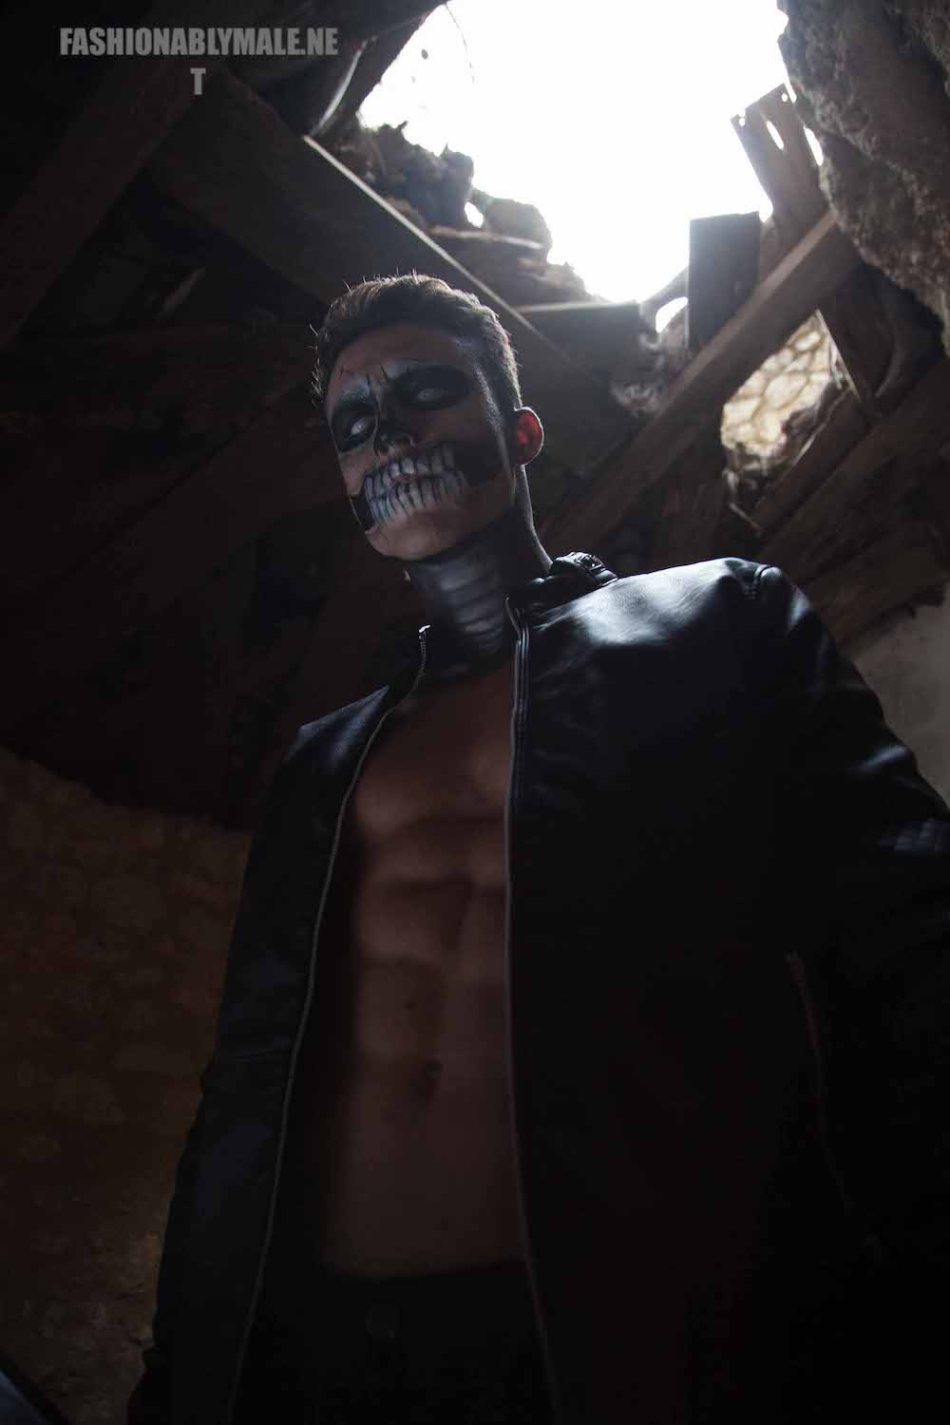 Halloween Skull Boy Borja by Jose Martinez7